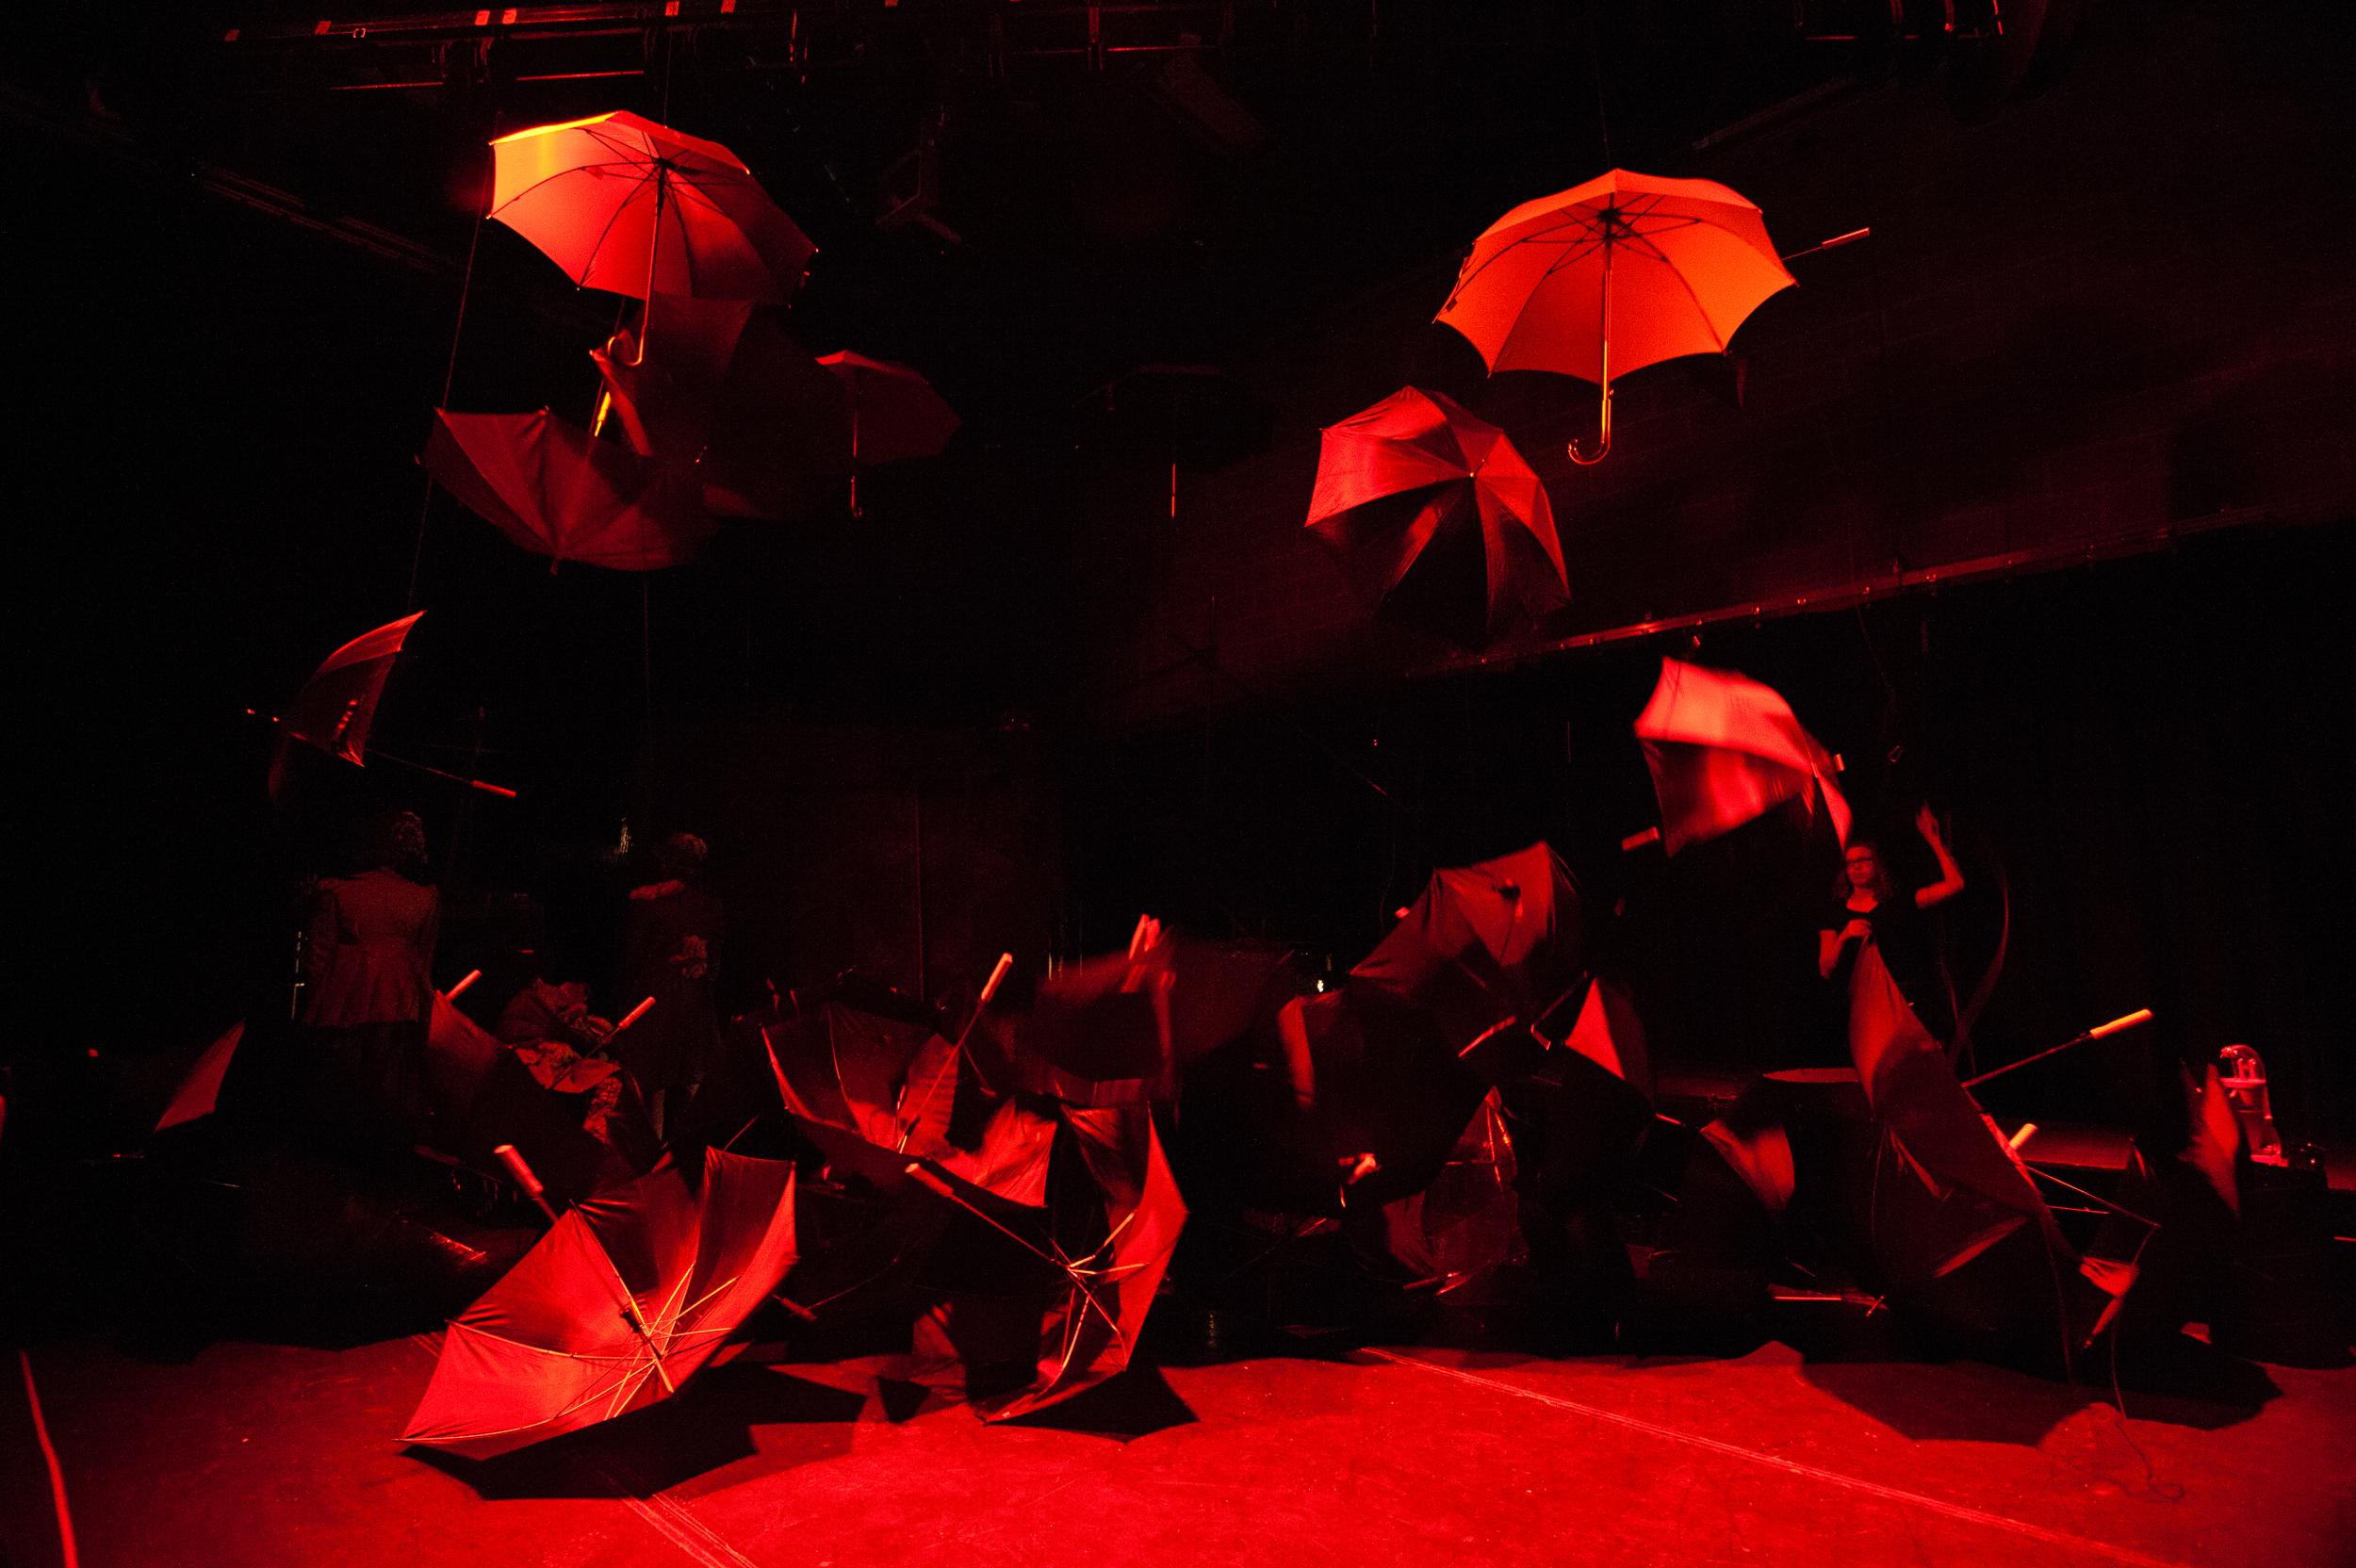 Umbrella Wall Mid Fall